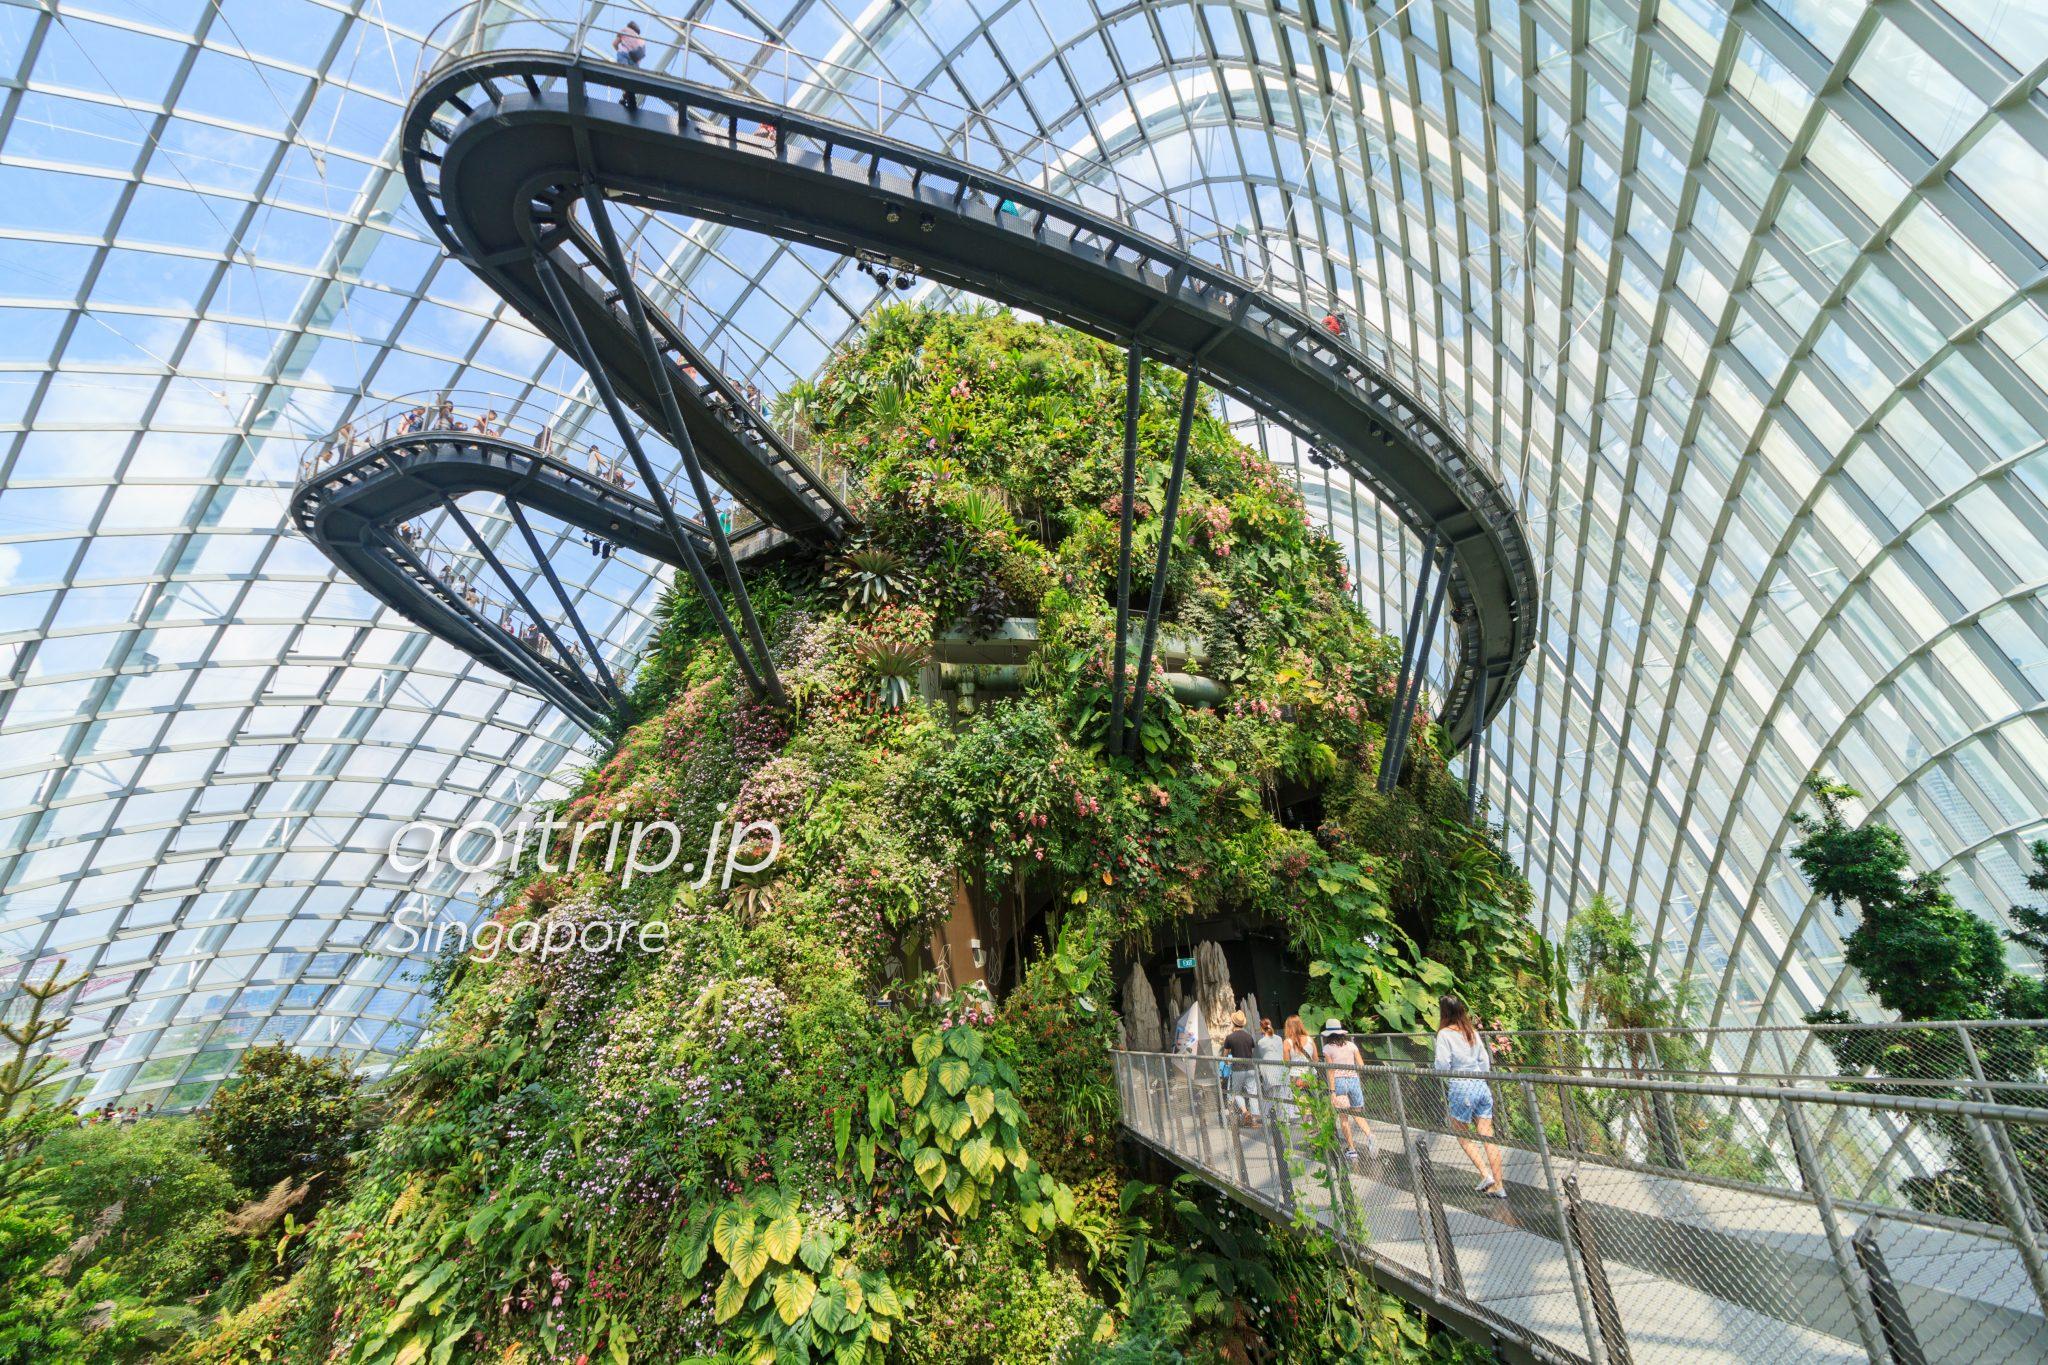 singapore gardensbythebay cloudforest